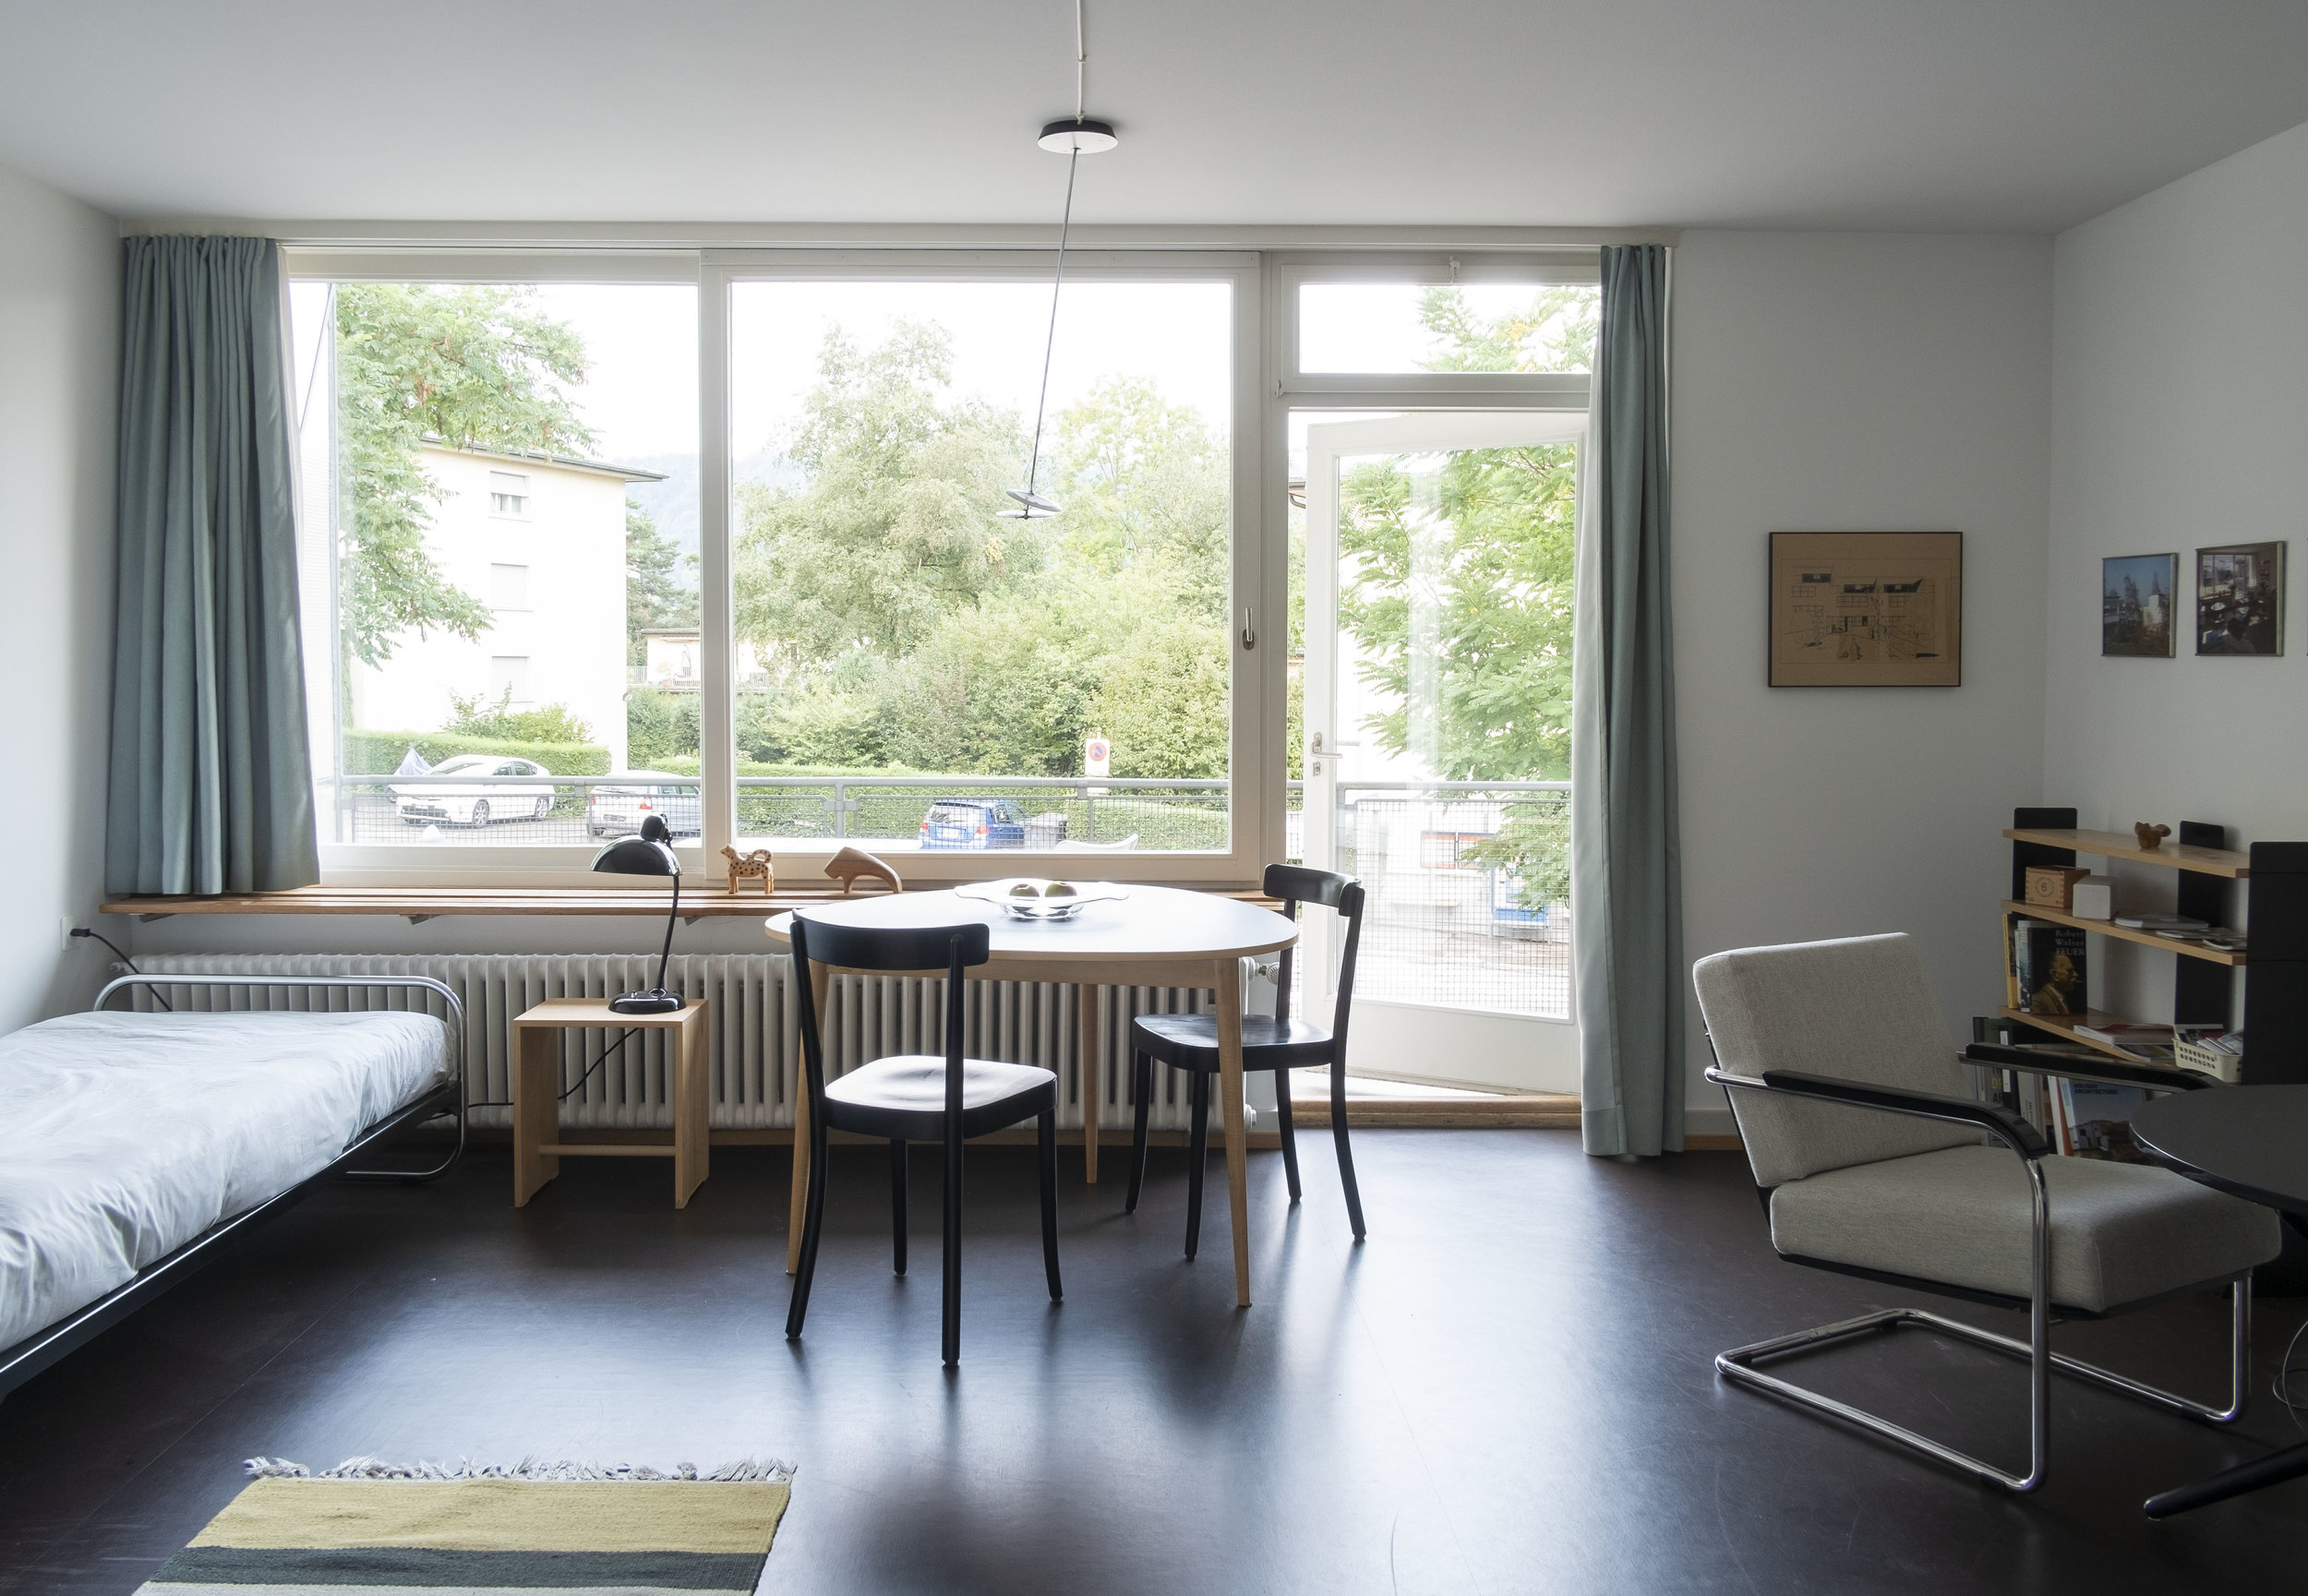 The guest apartment studio room